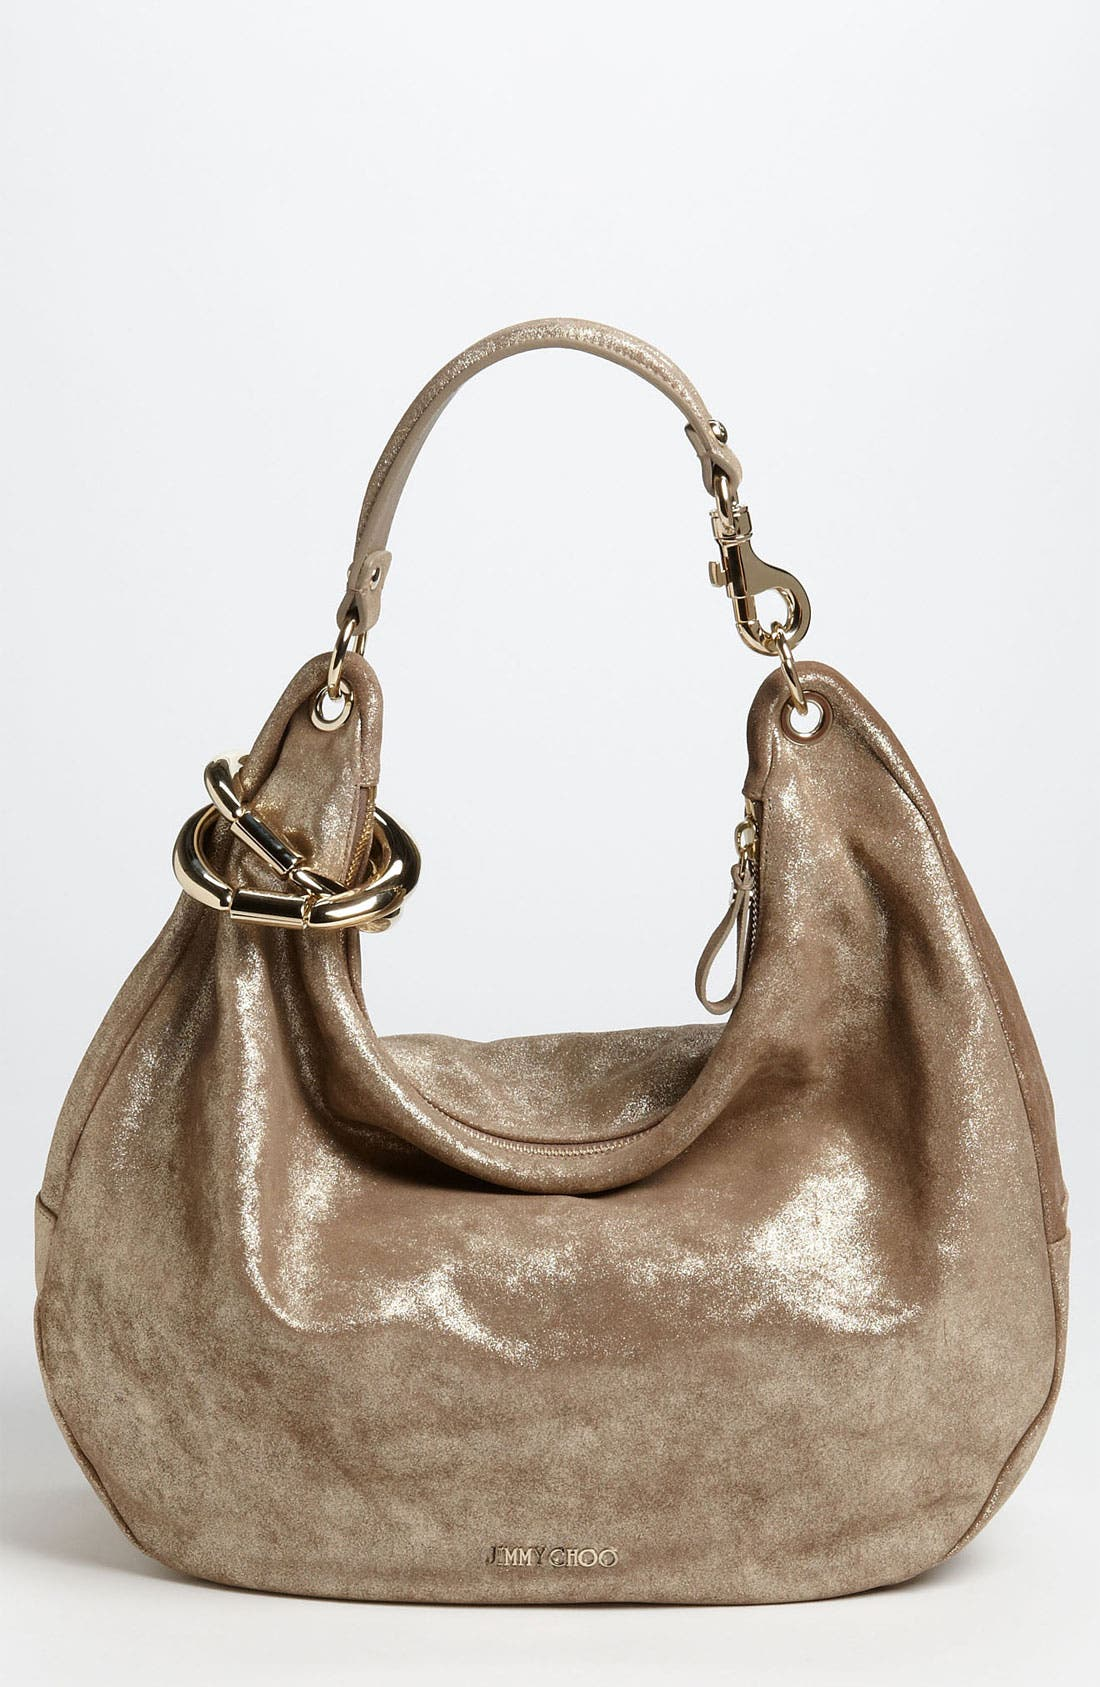 Main Image - Jimmy Choo 'Solar - Large' Metallic Leather Hobo